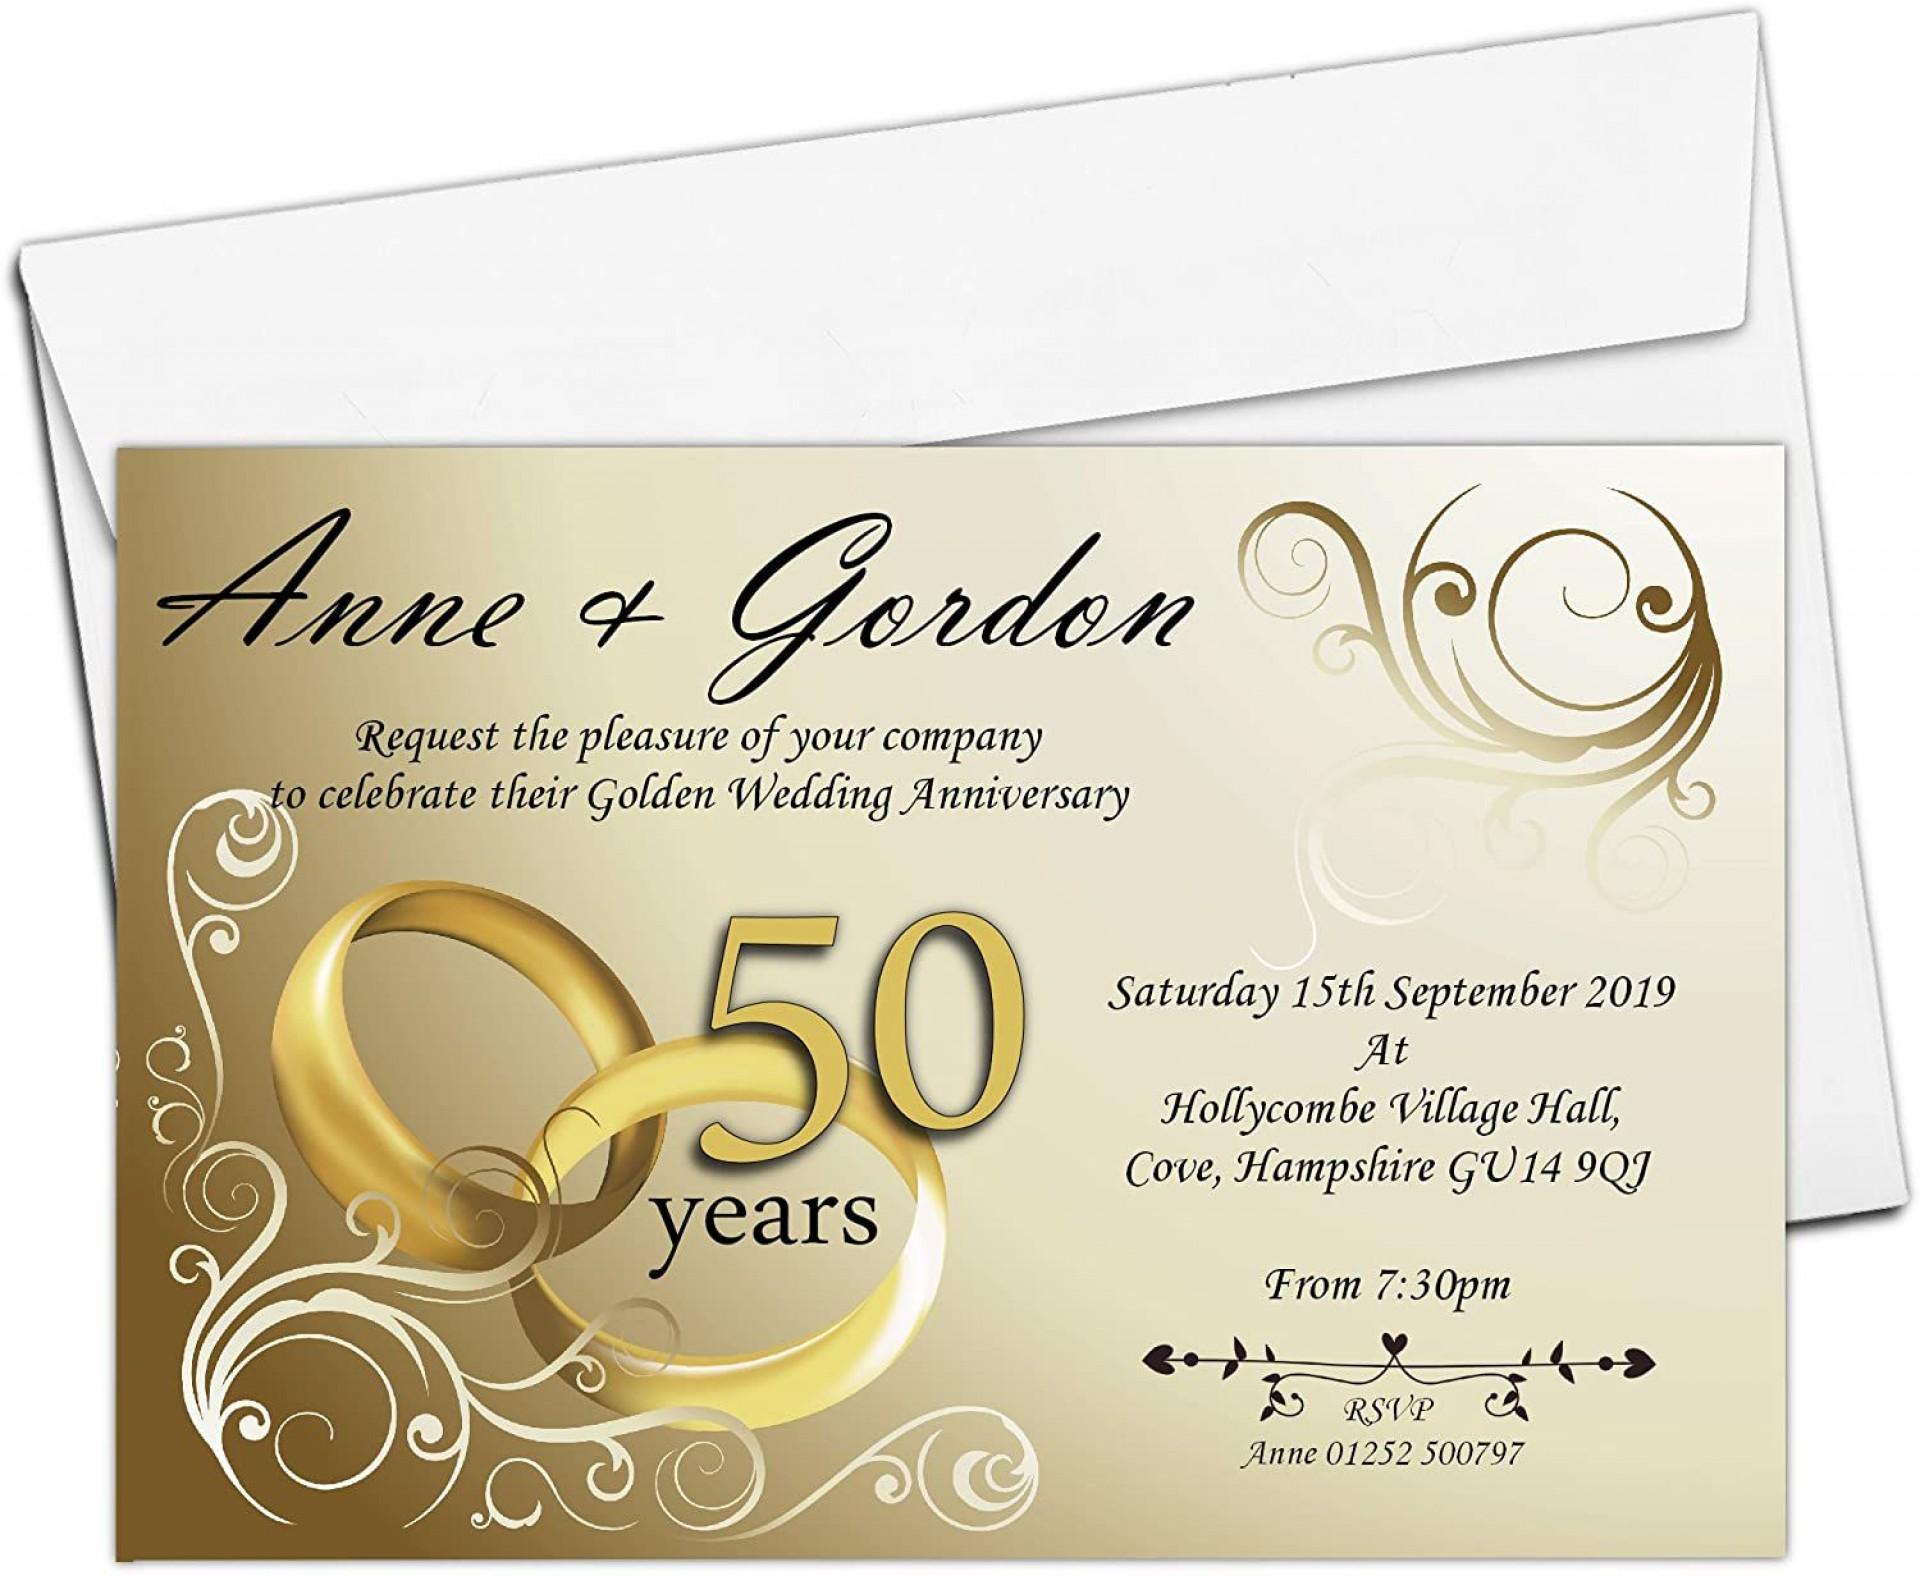 003 Shocking 50th Wedding Anniversary Invitation Design Idea  Designs Wording Sample Card Template Free Download1920